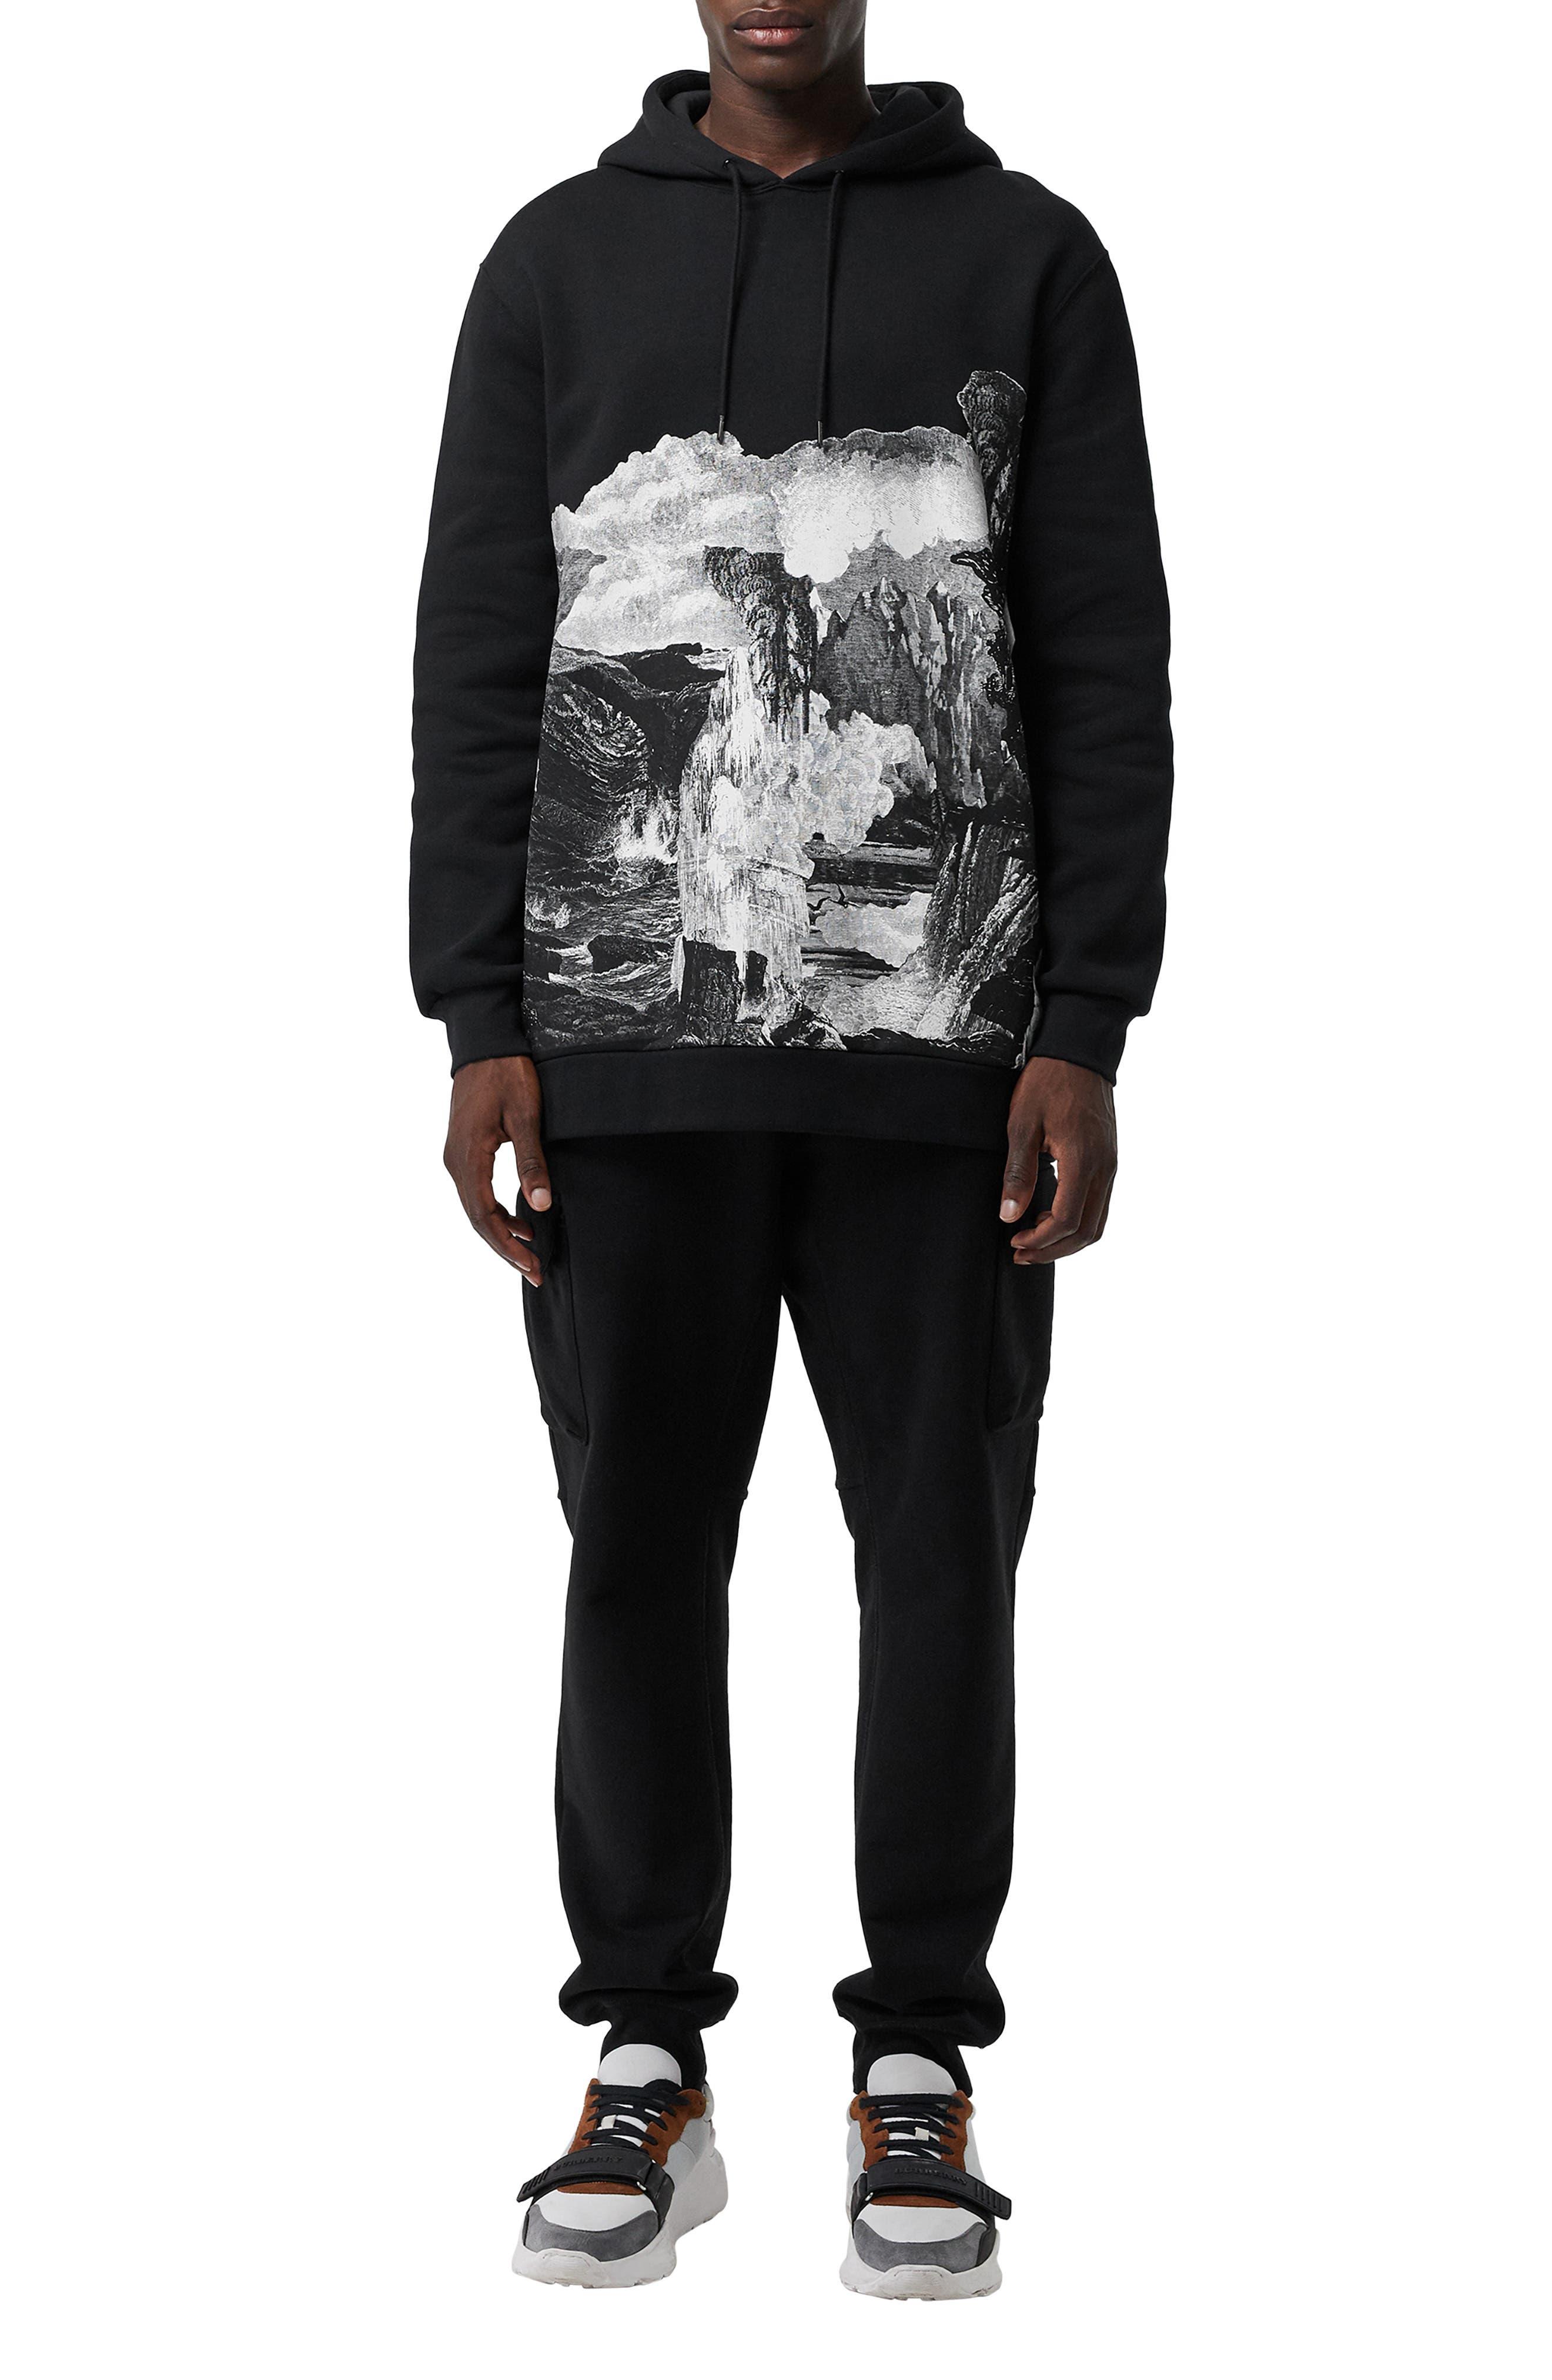 BURBERRY, Dreamscape Print Hooded Sweatshirt, Alternate thumbnail 6, color, BLACK